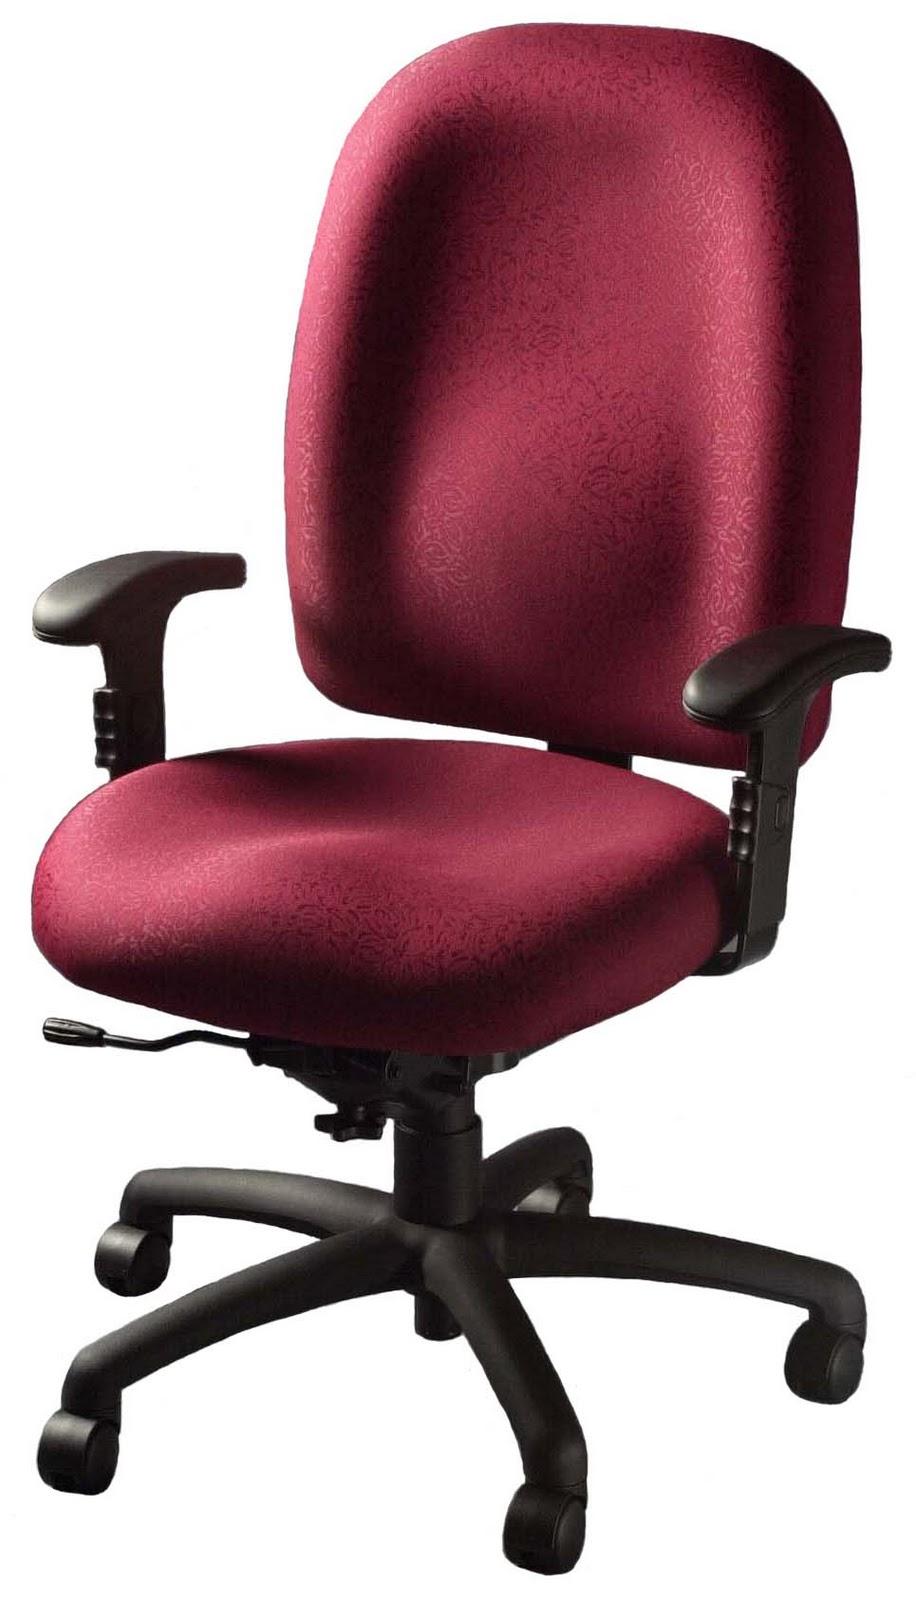 Home Interior Design Design of ergonomic office chairs